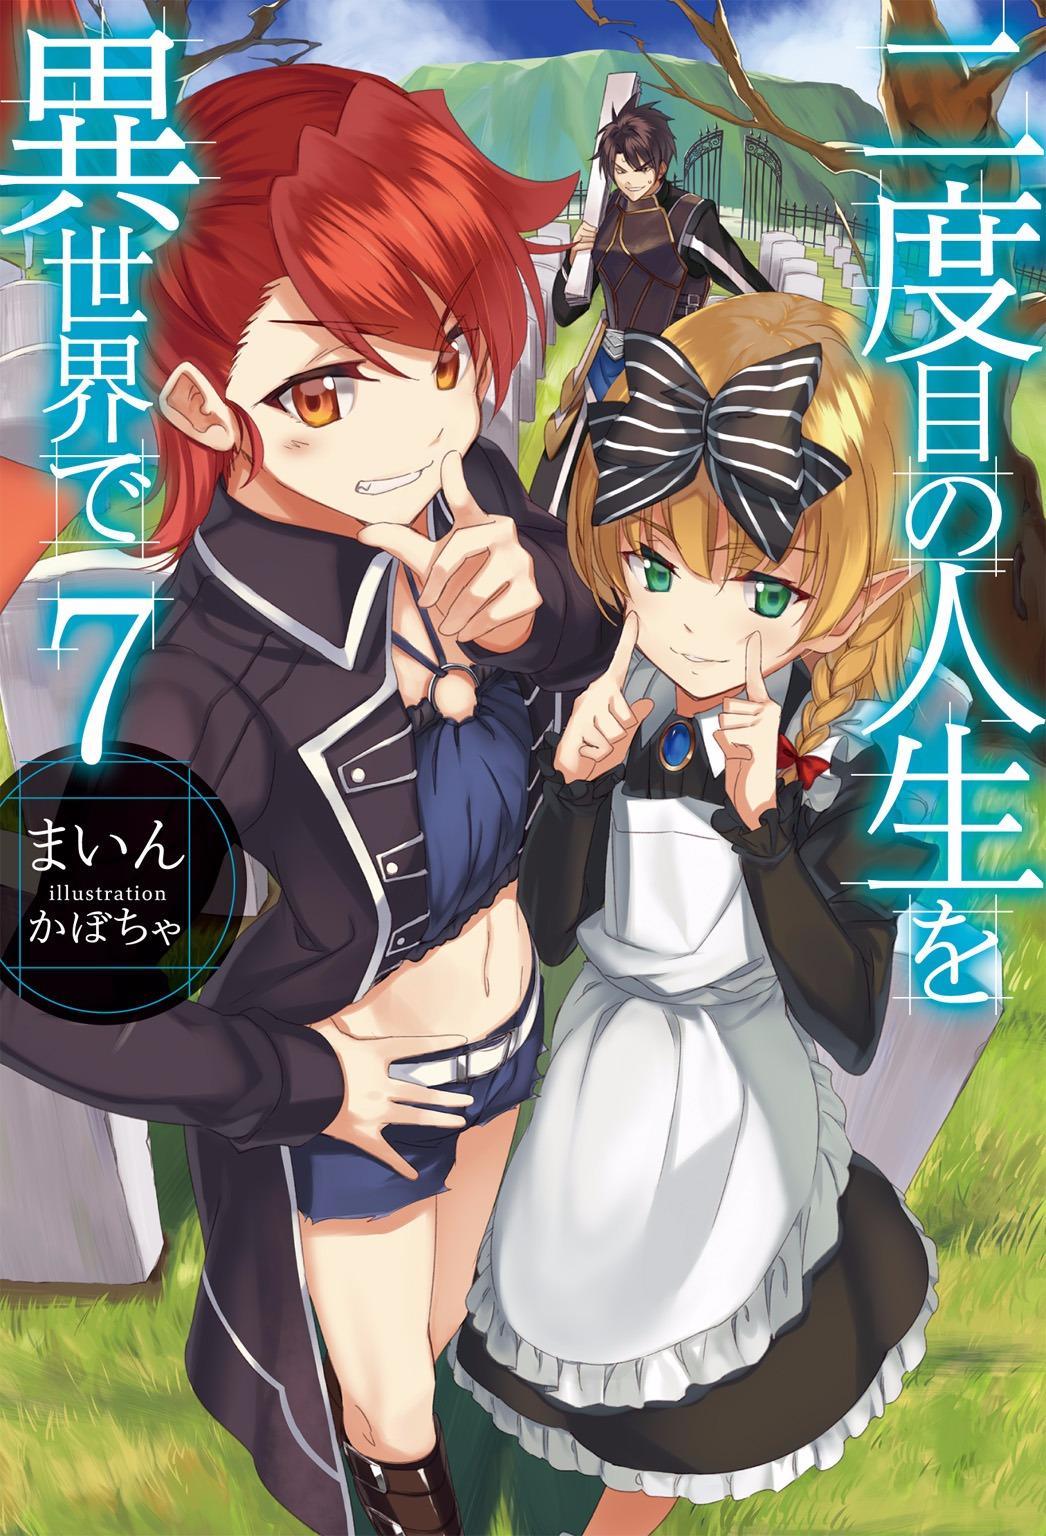 Nidoume no Jinsei wo Isekai de – Infinite Novel Translations